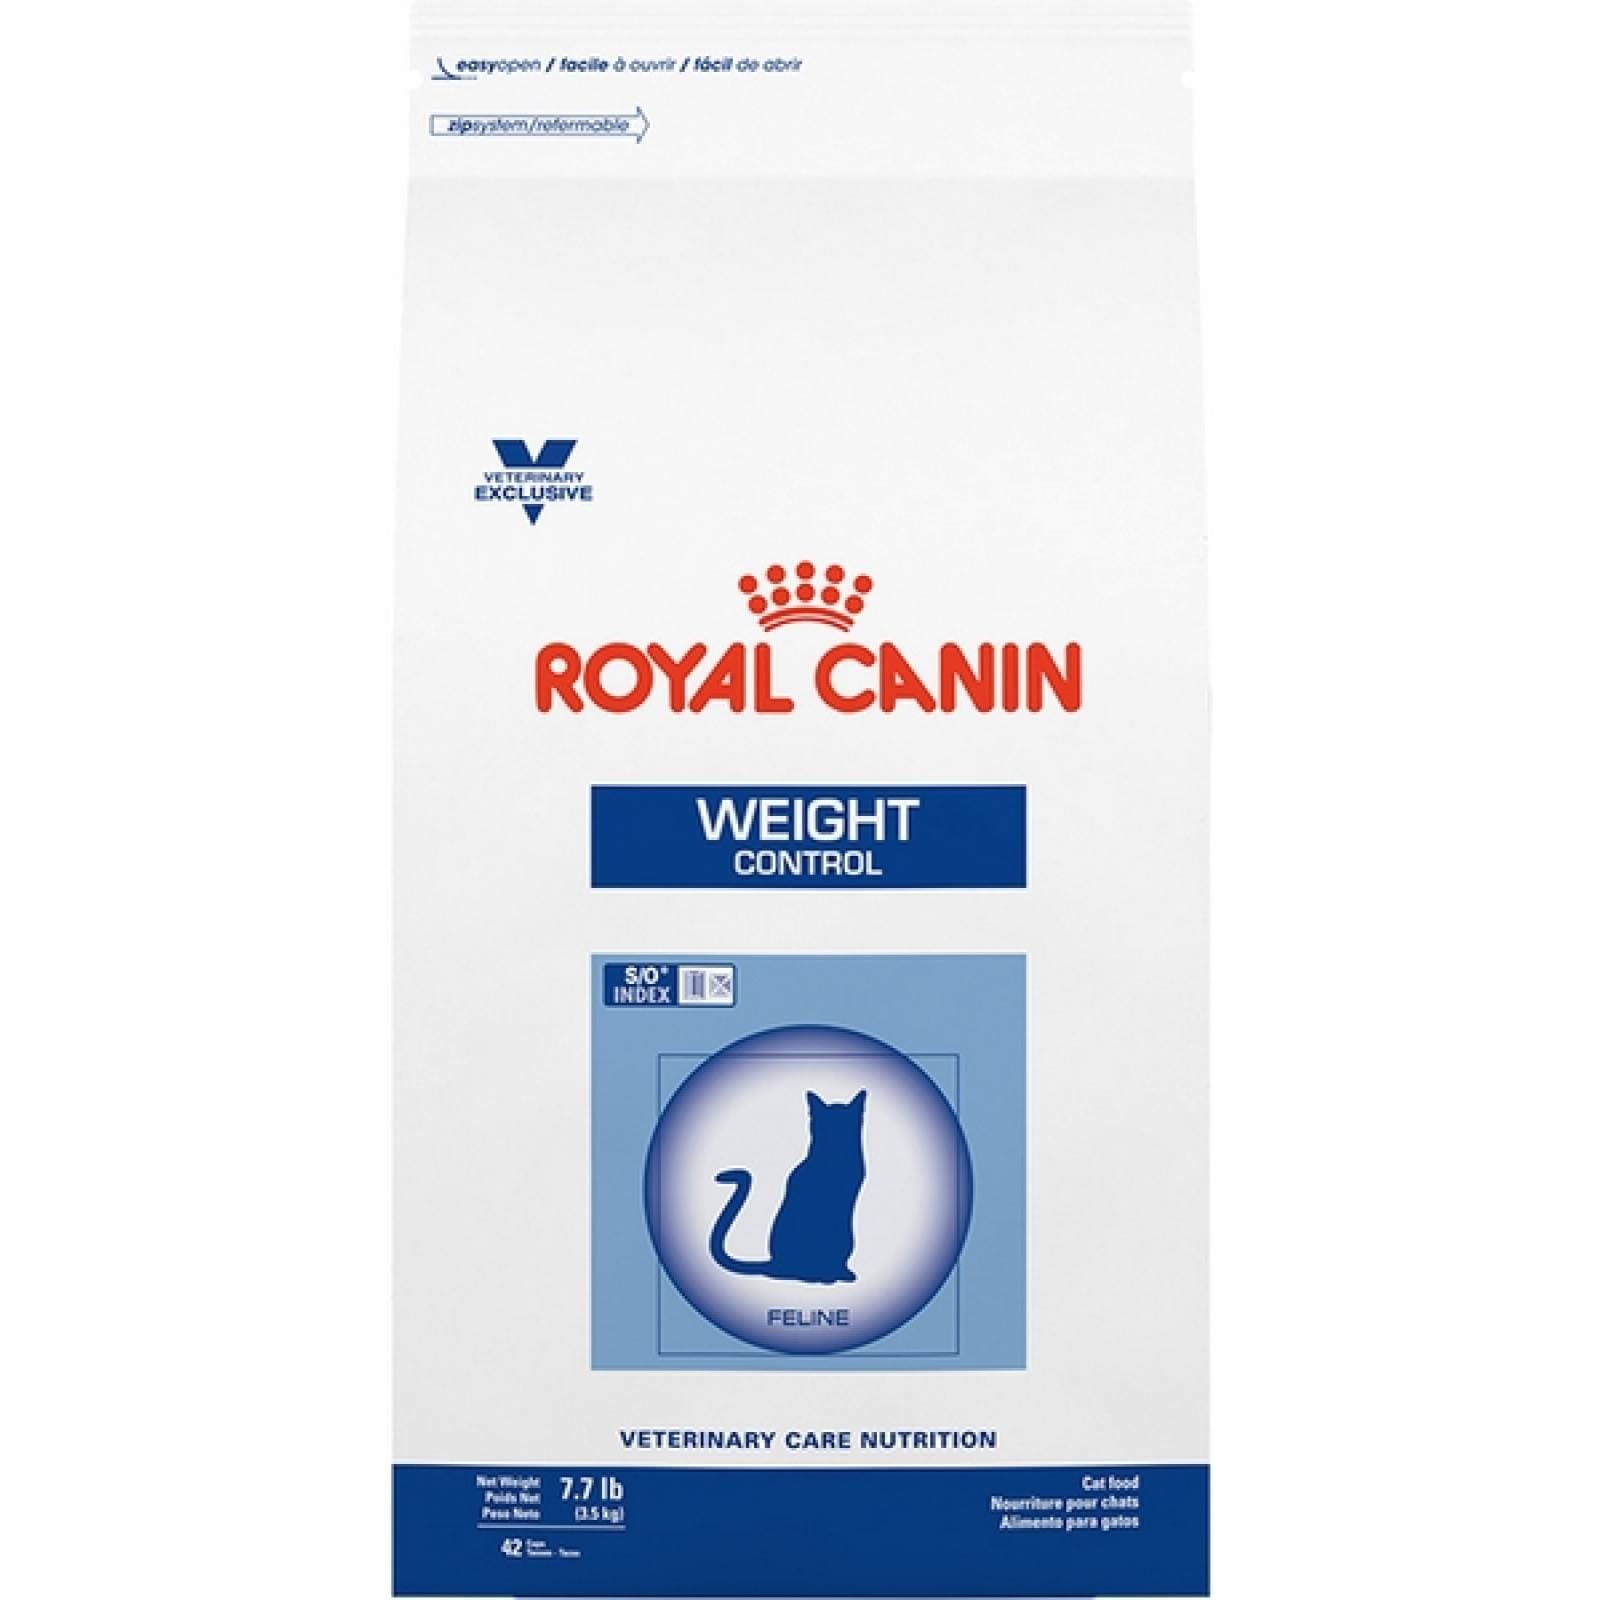 Royal Canin Dieta Veterinaria Alimento para Gato Adulto Control de Peso 8 Kg